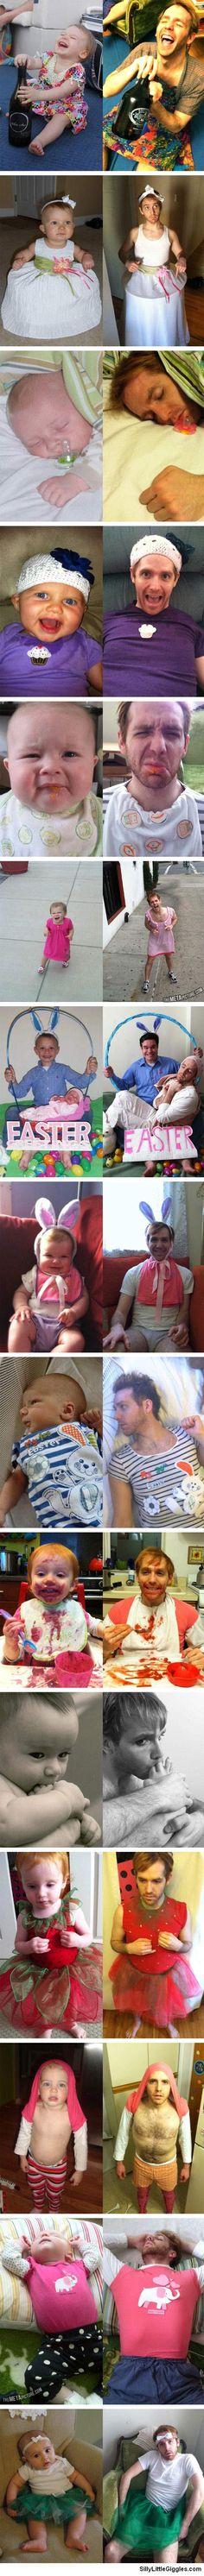 Funny Baby Photos Reenactment